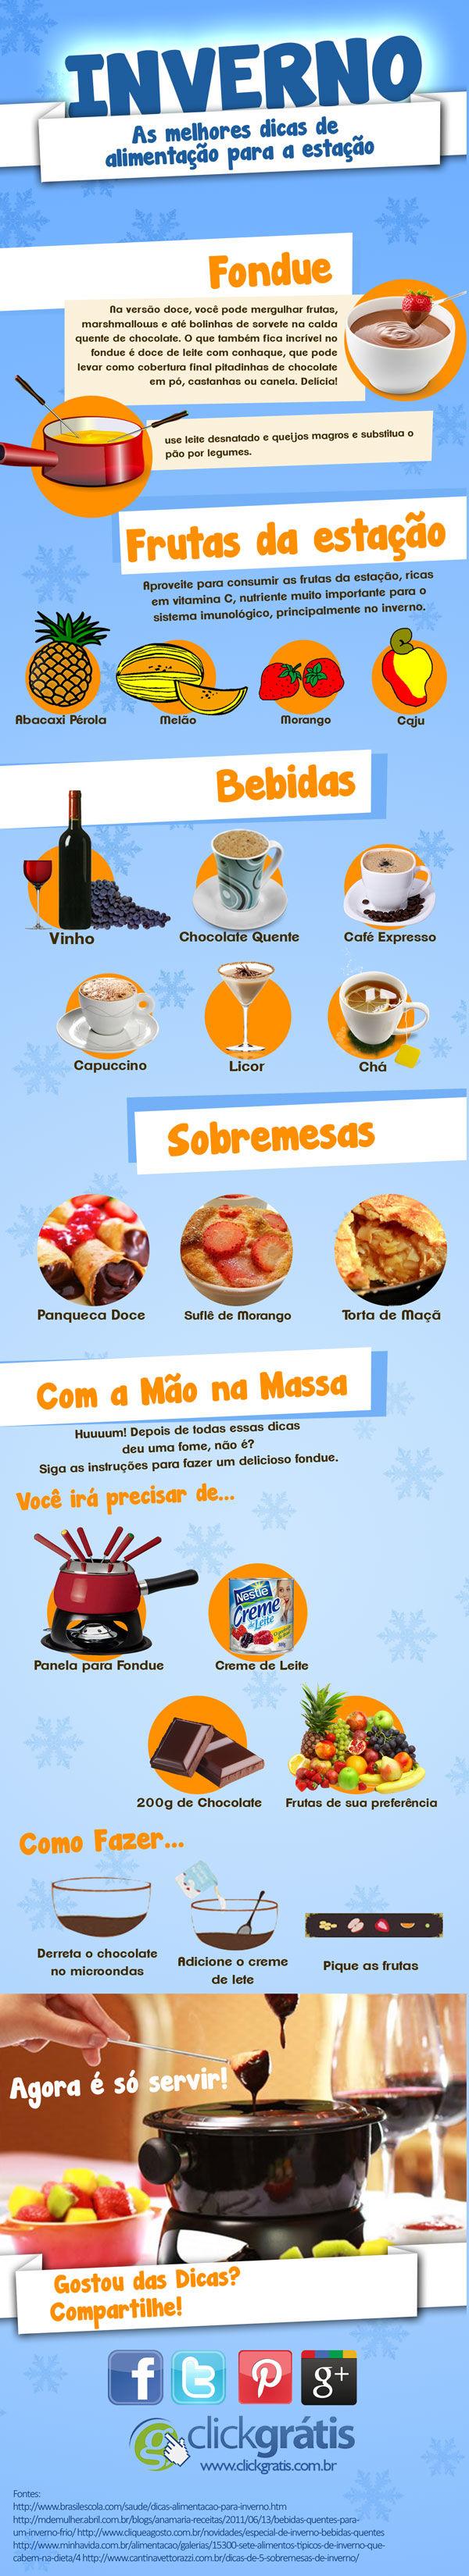 Tipos de comidas no inverno